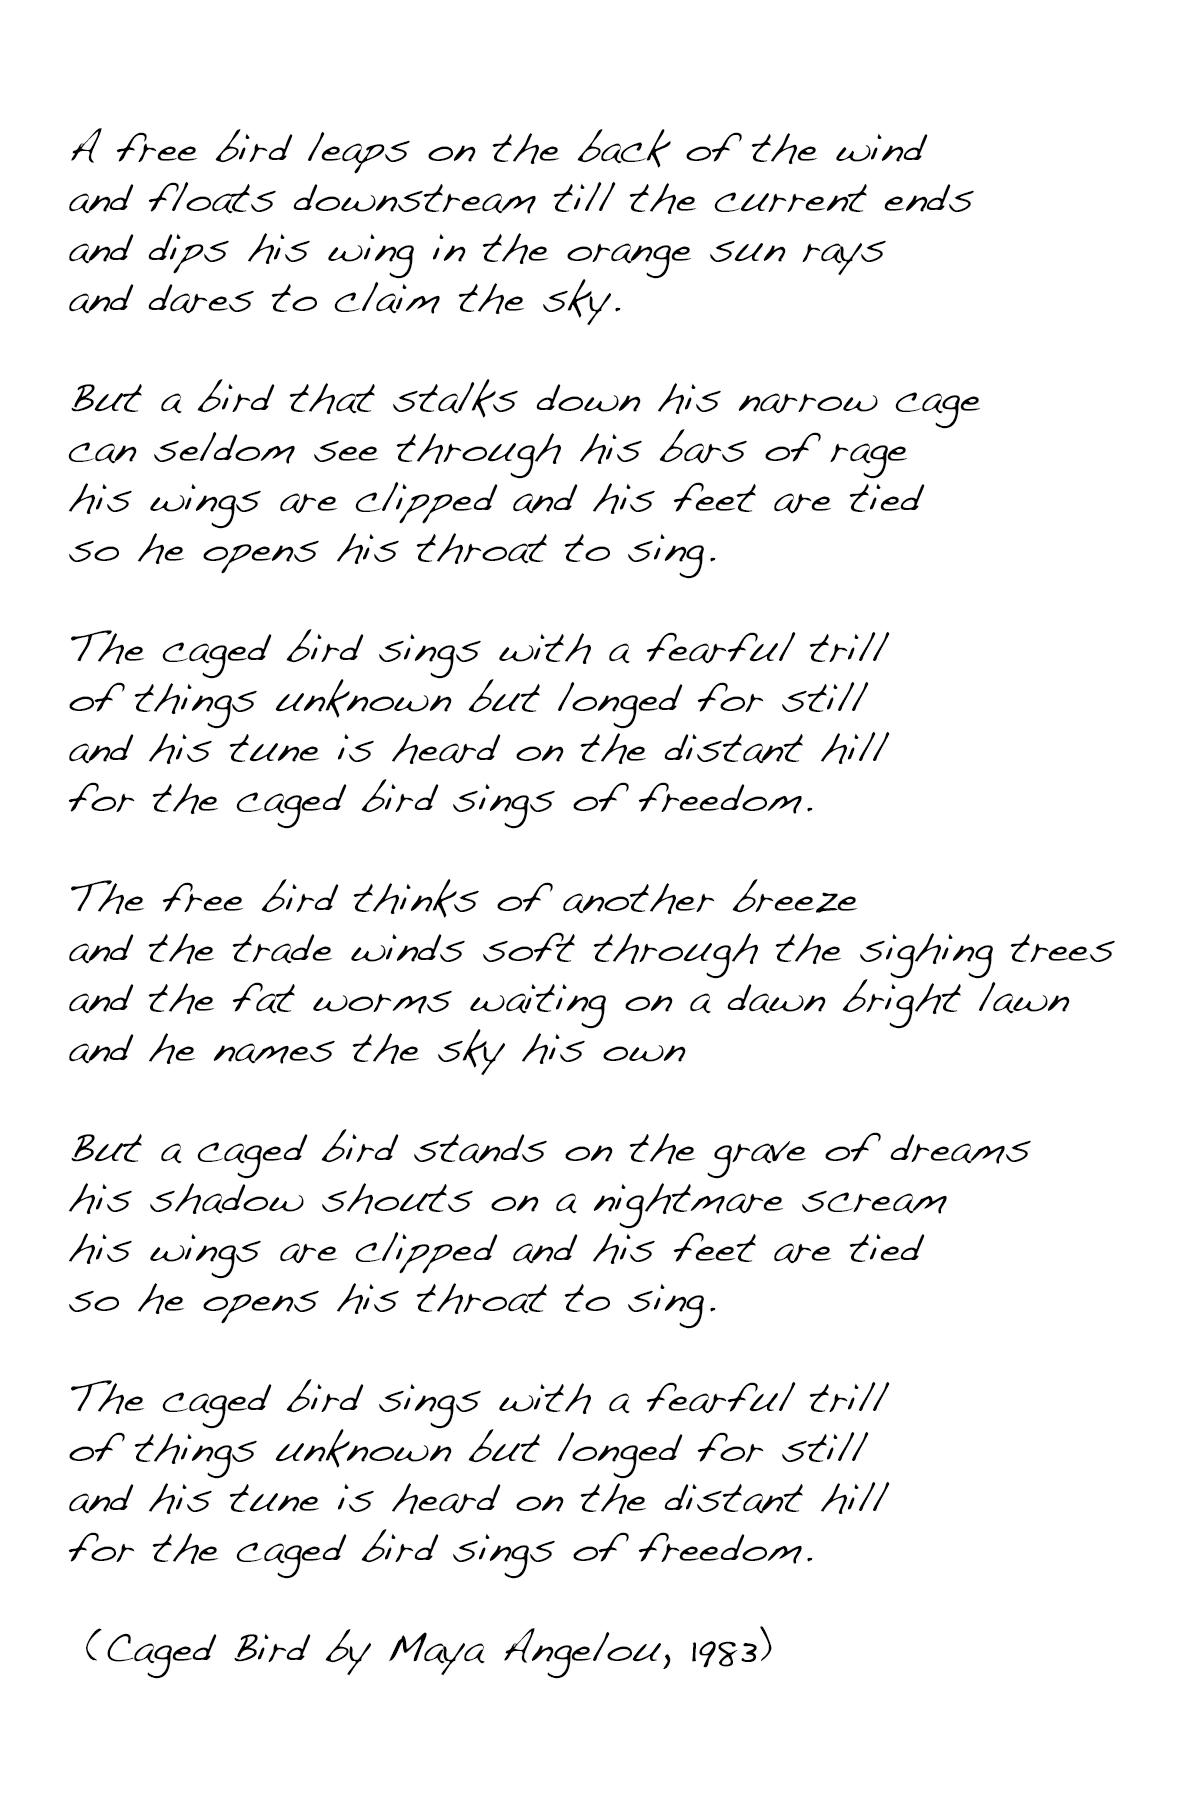 Postcard Poetry (Side 2)